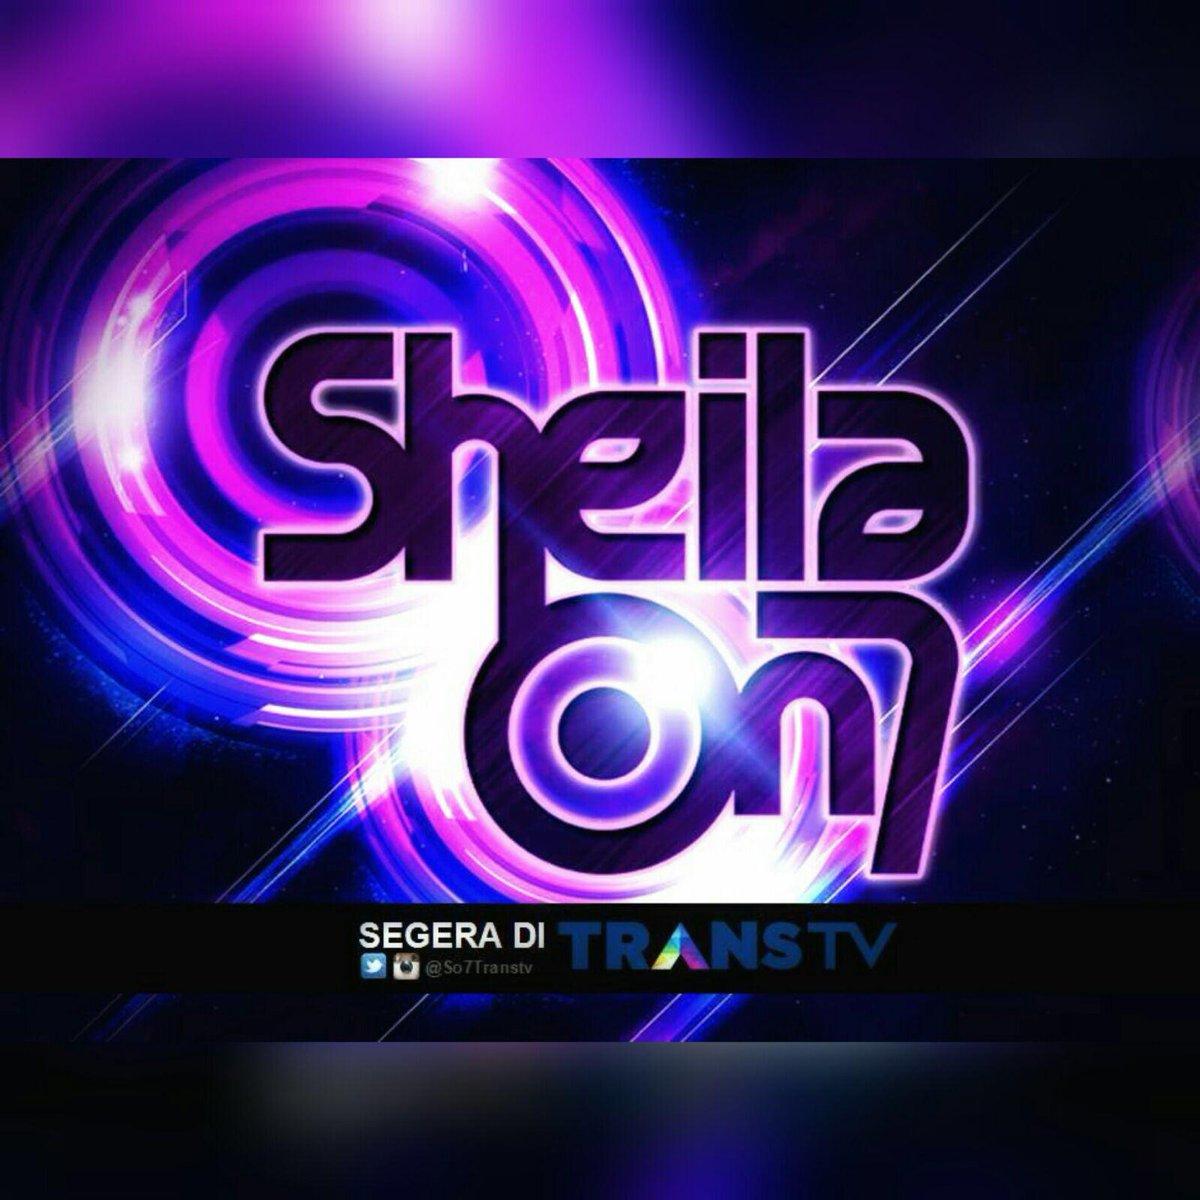 Trans Tv On Twitter Sheila On 7 Segera Di Trans Tv